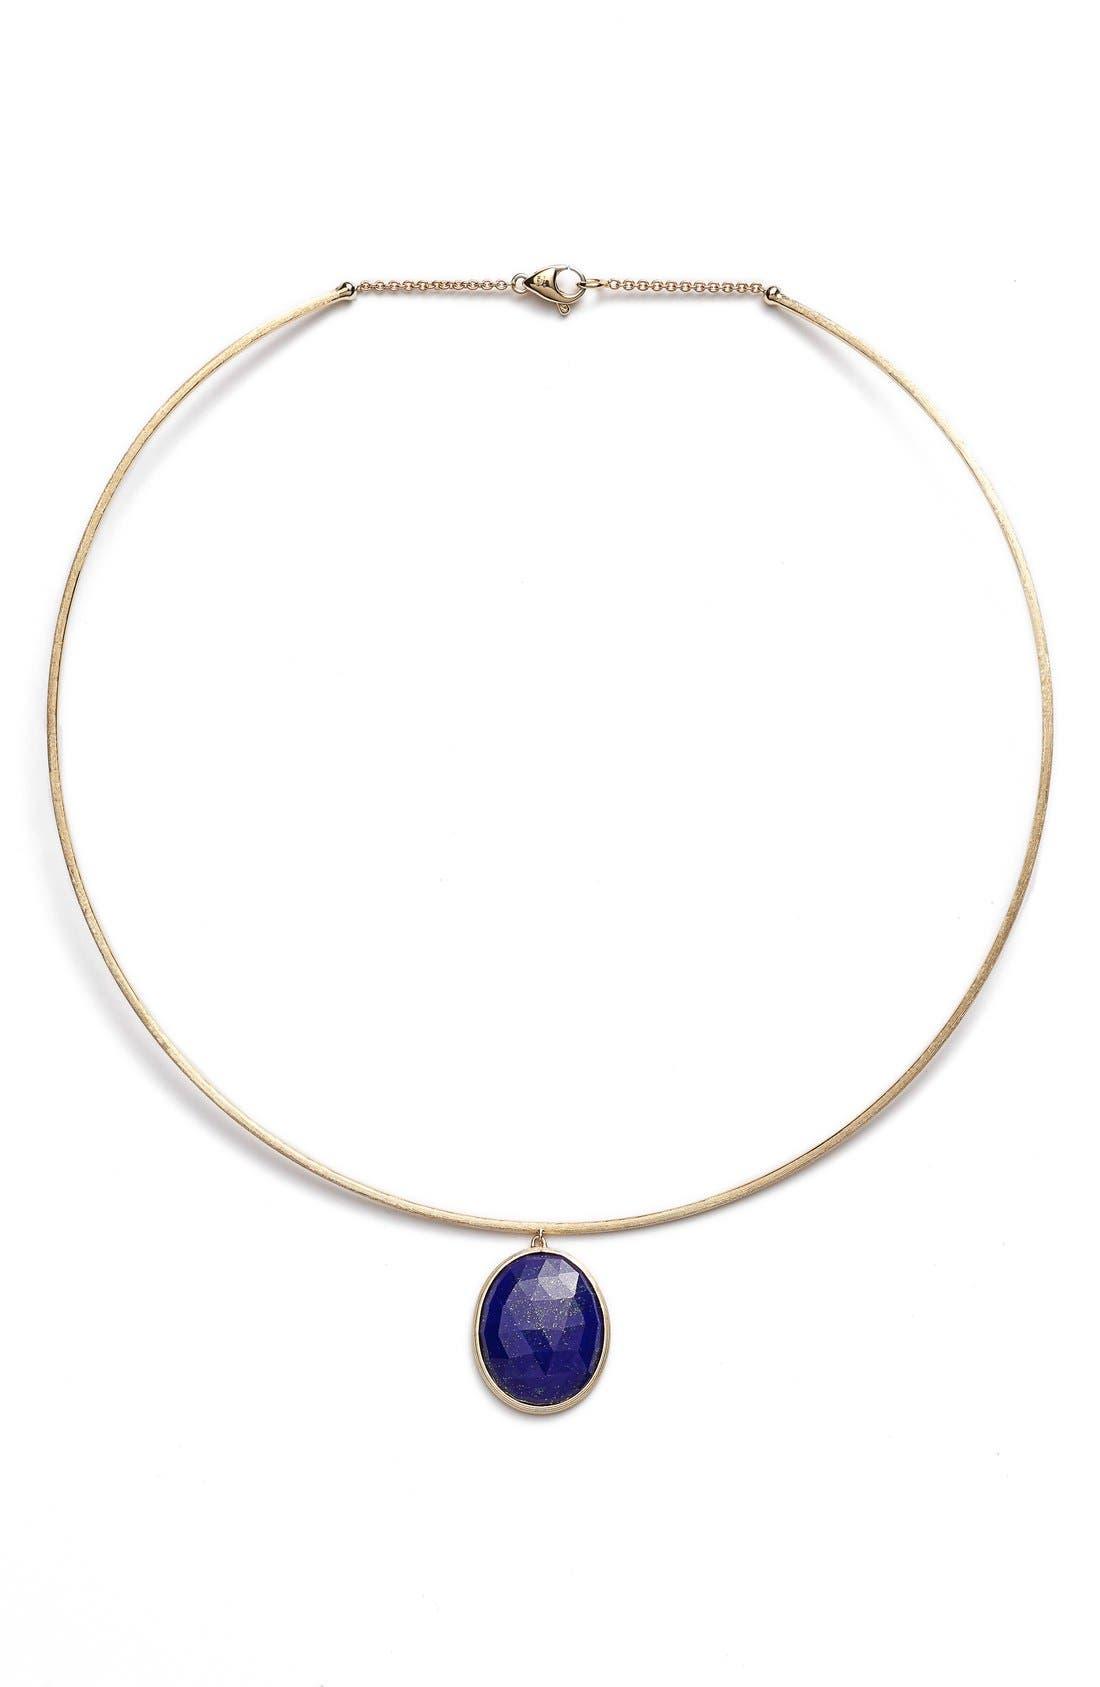 'Lunaria' Lapis Collar Necklace,                         Main,                         color, Yellow Gold/ Lapis